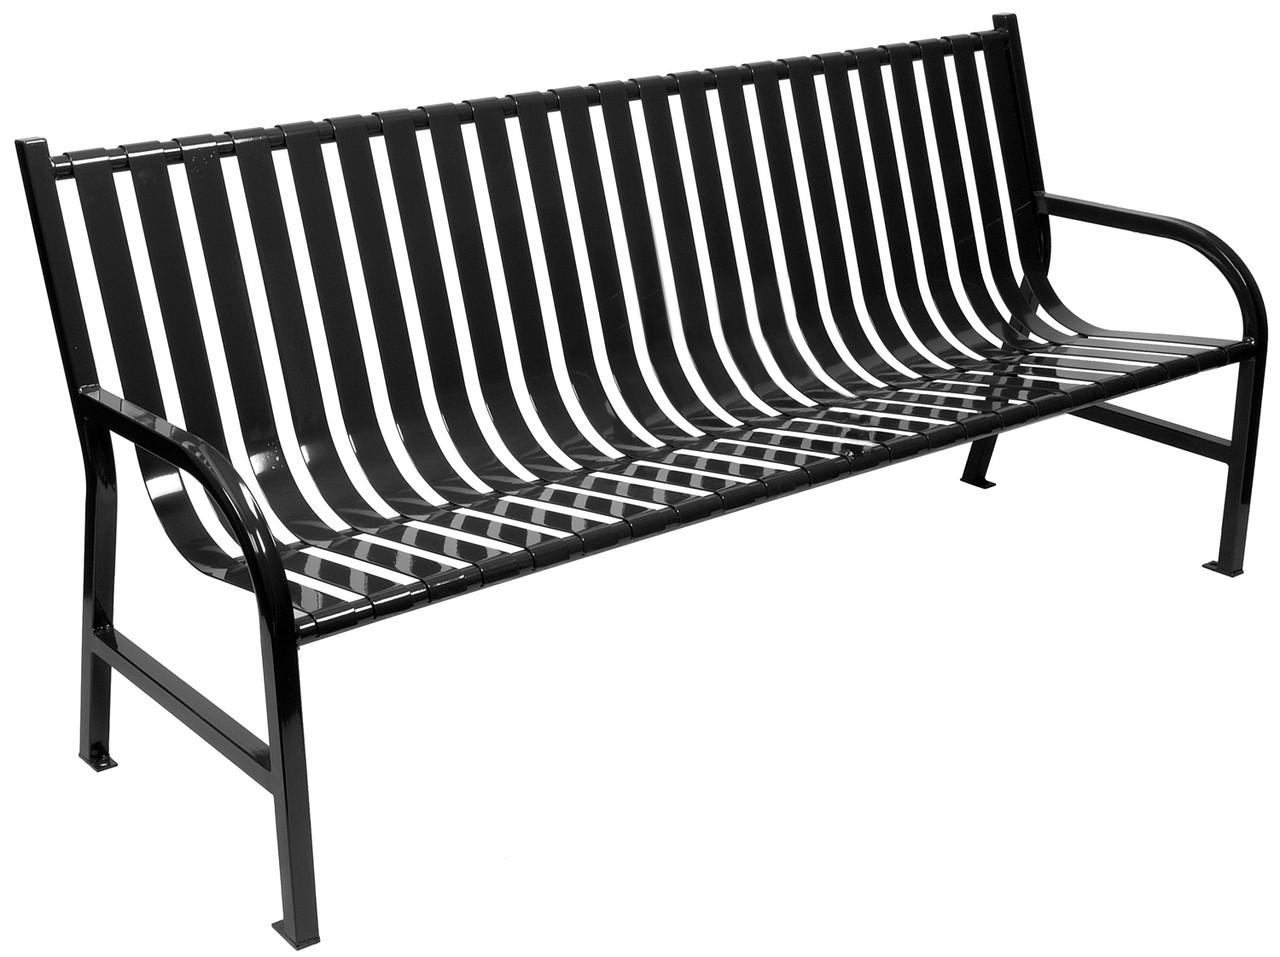 Witt Industries Oakley Outdoor Slatted Bench 6 Foot Black